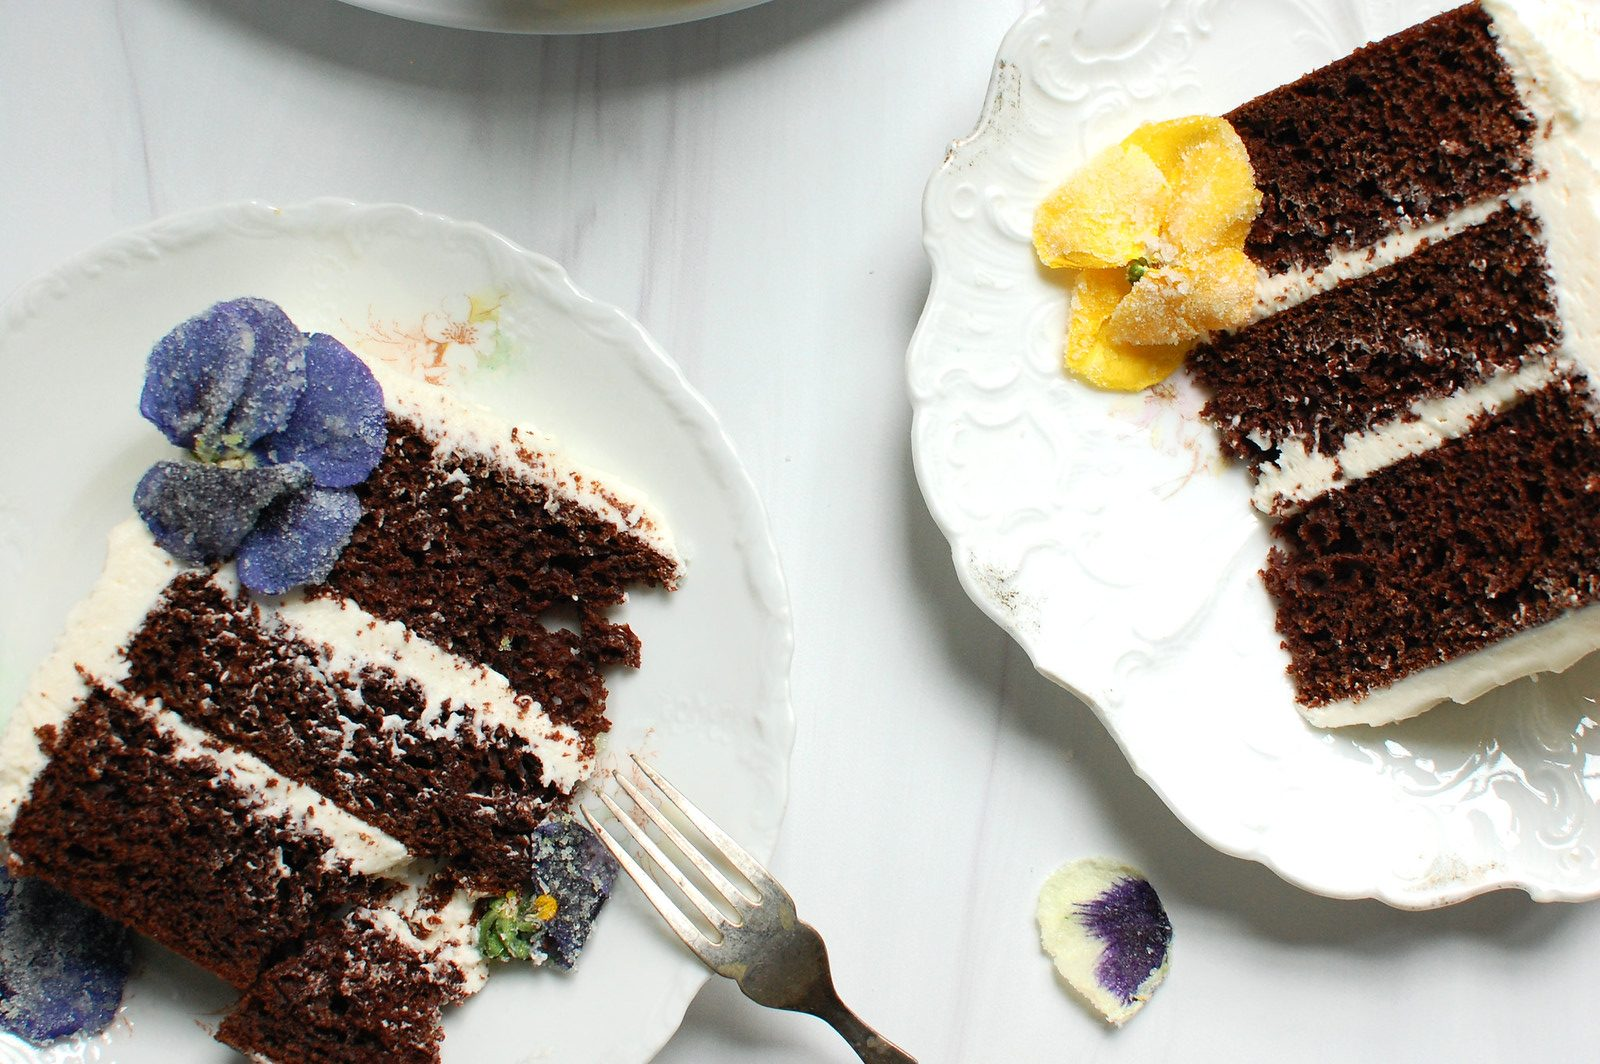 How to Make Box Cake Better